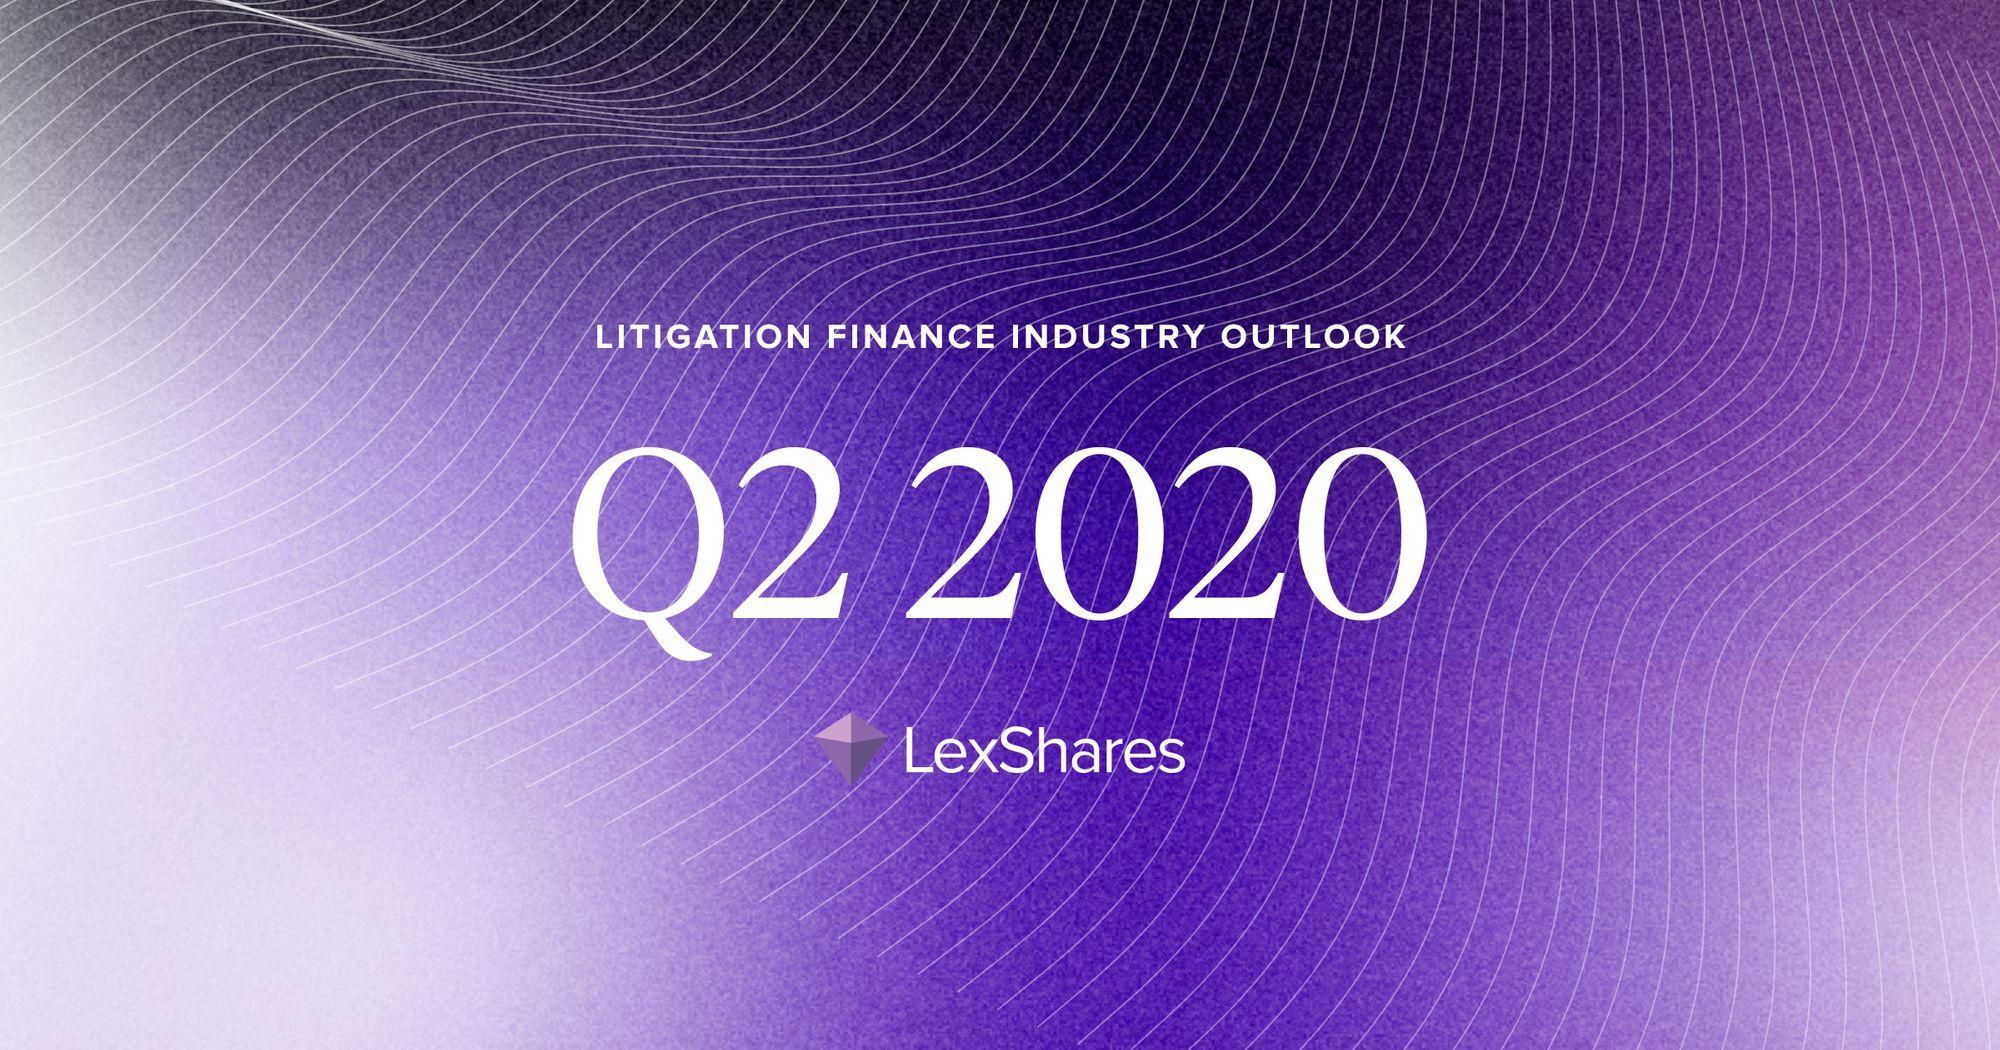 Litigation Finance Industry Outlook: Q2 2020